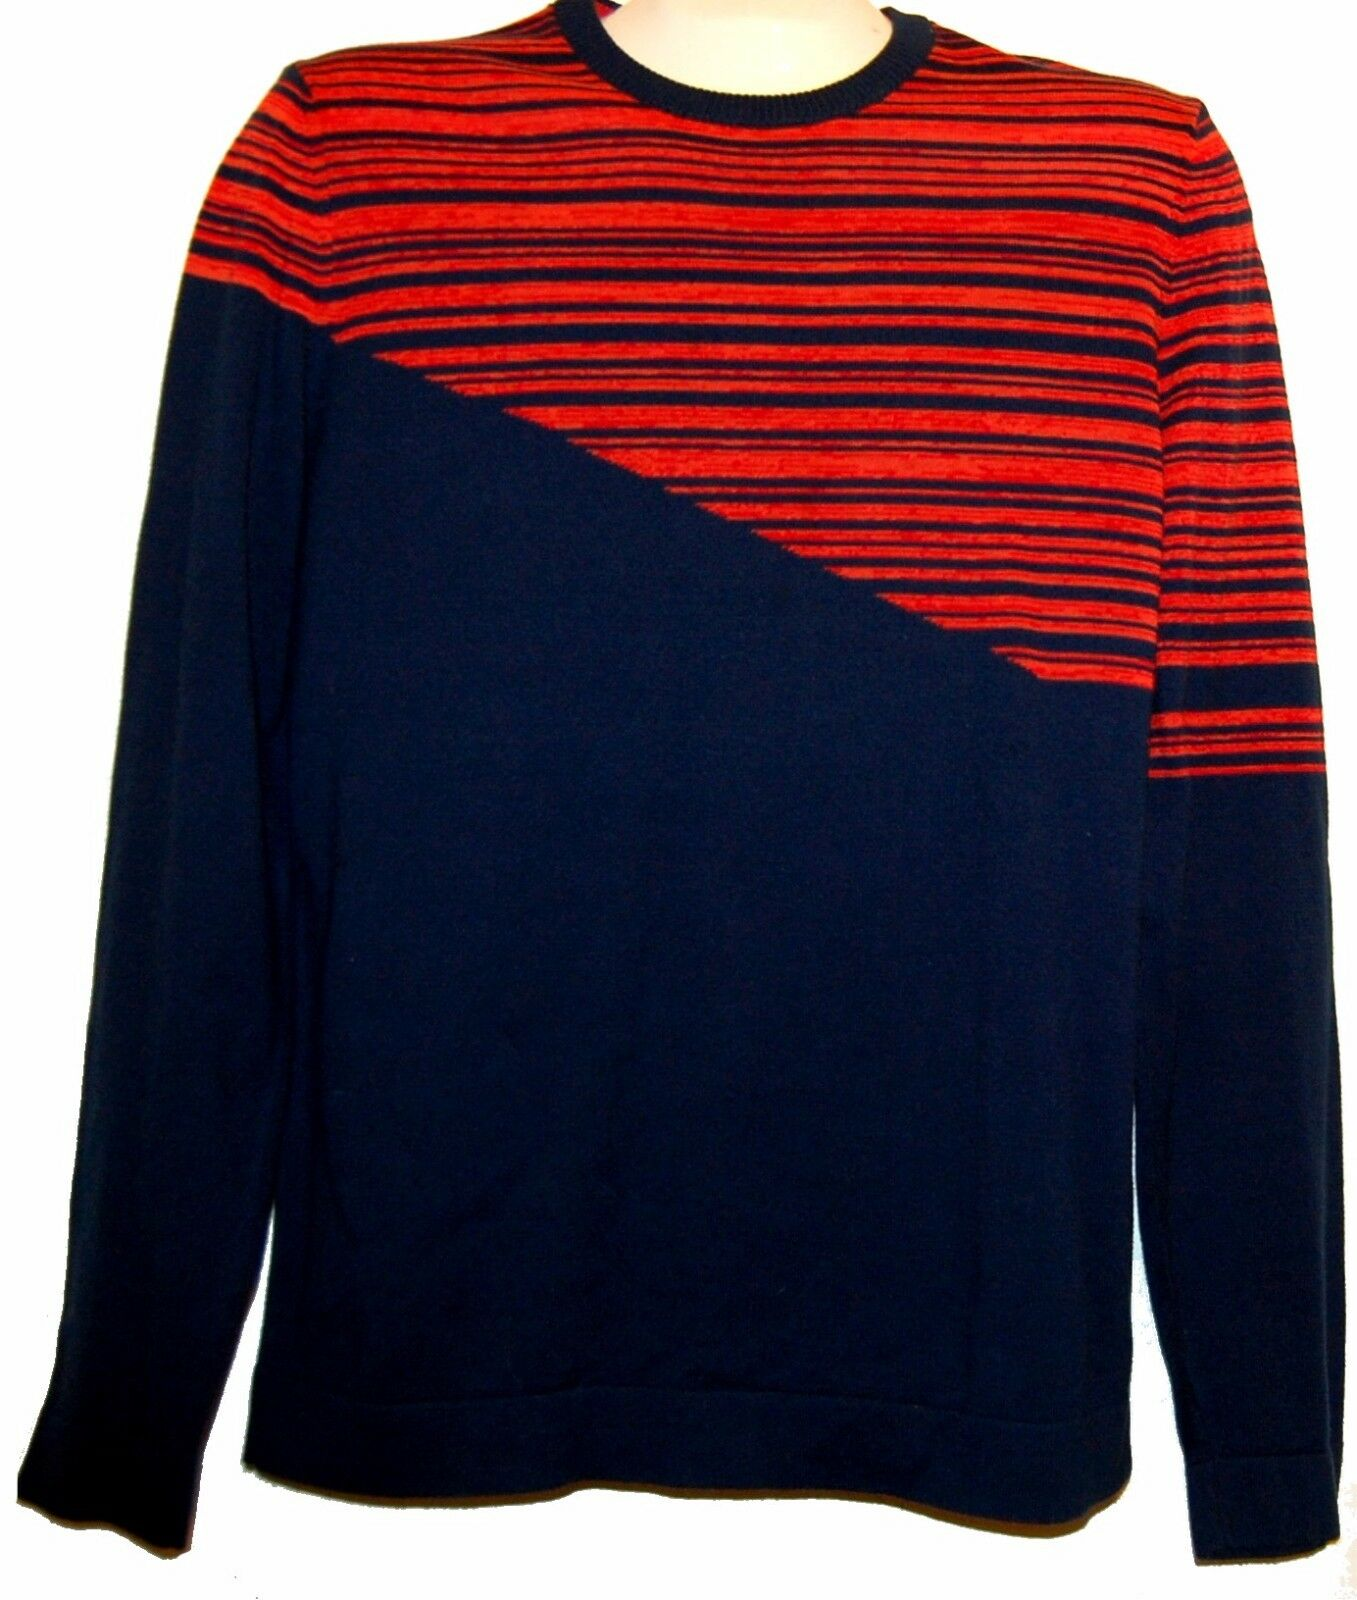 Hugo Boss  bluee Red  Striped Long Sleeve Men's Sweater Size M